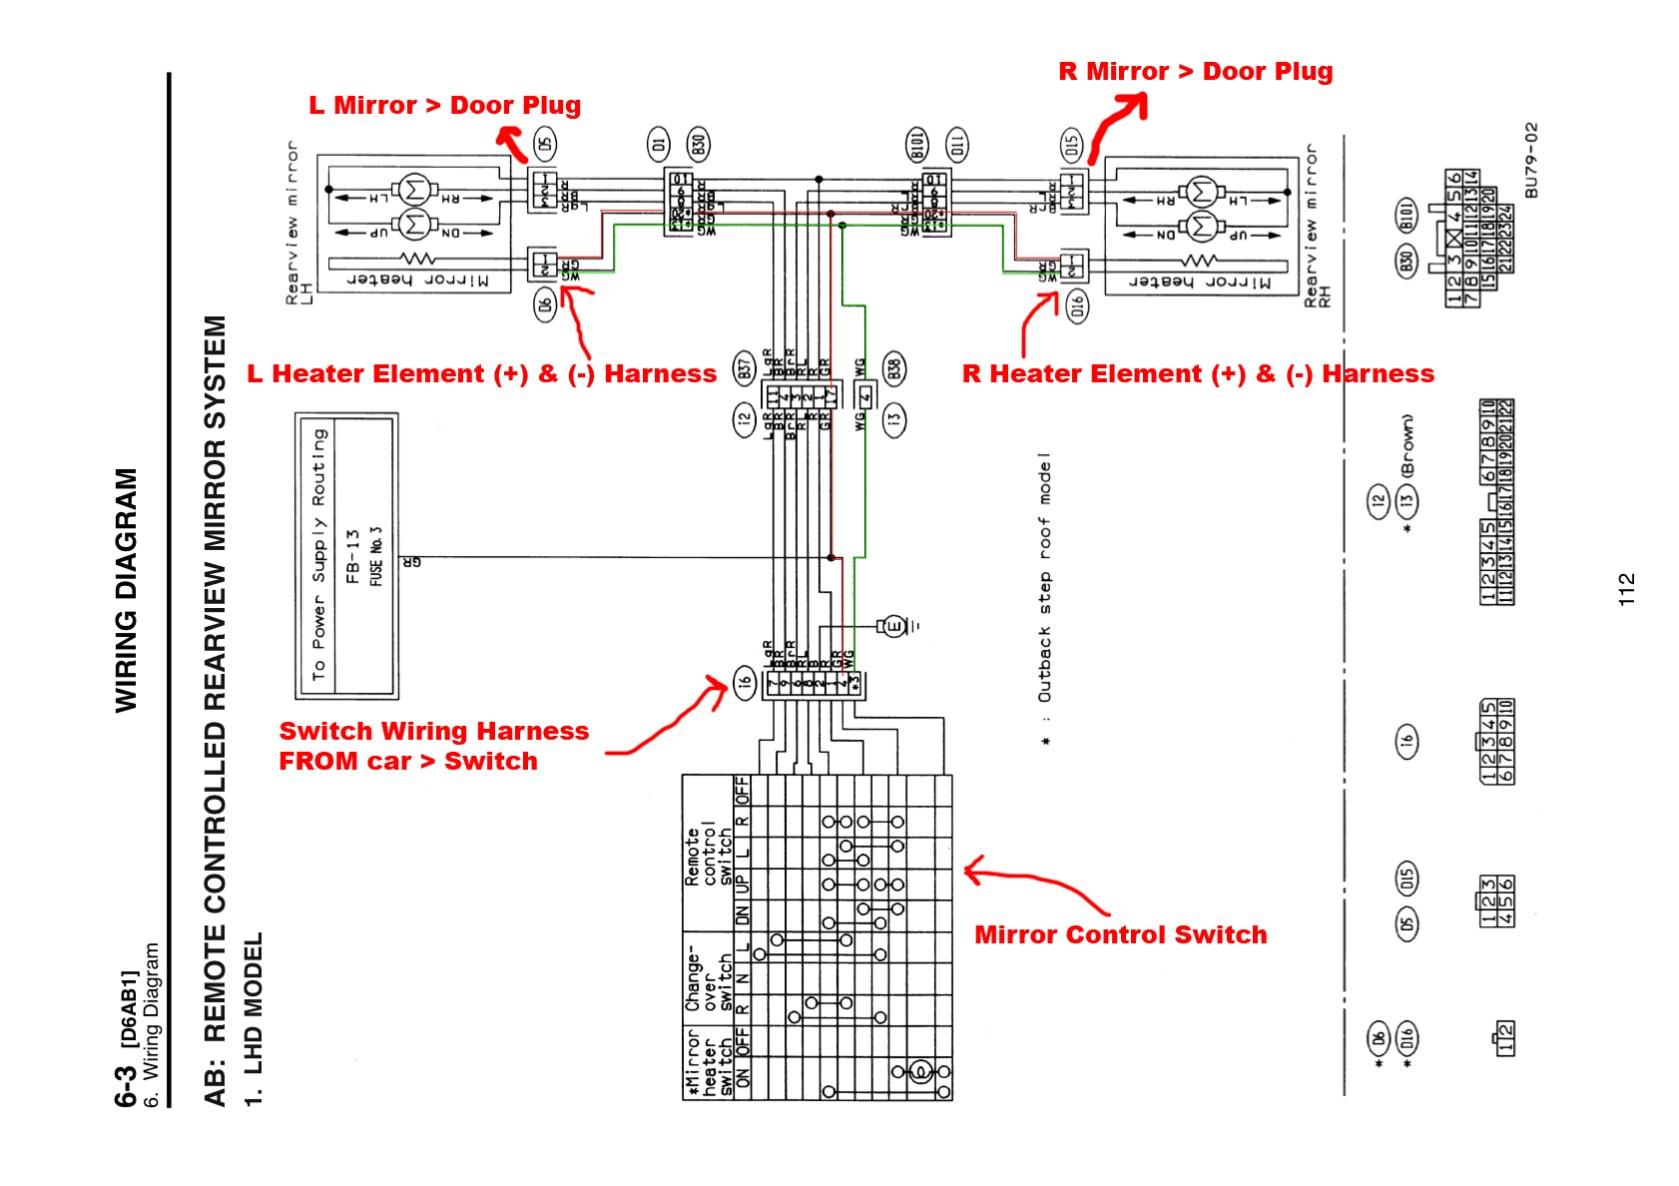 subaru legacy stereo wiring diagram  99 subaru legacy stereo wiring diagram wiring diagram on 2003 subaru legacy stereo wiring diagram